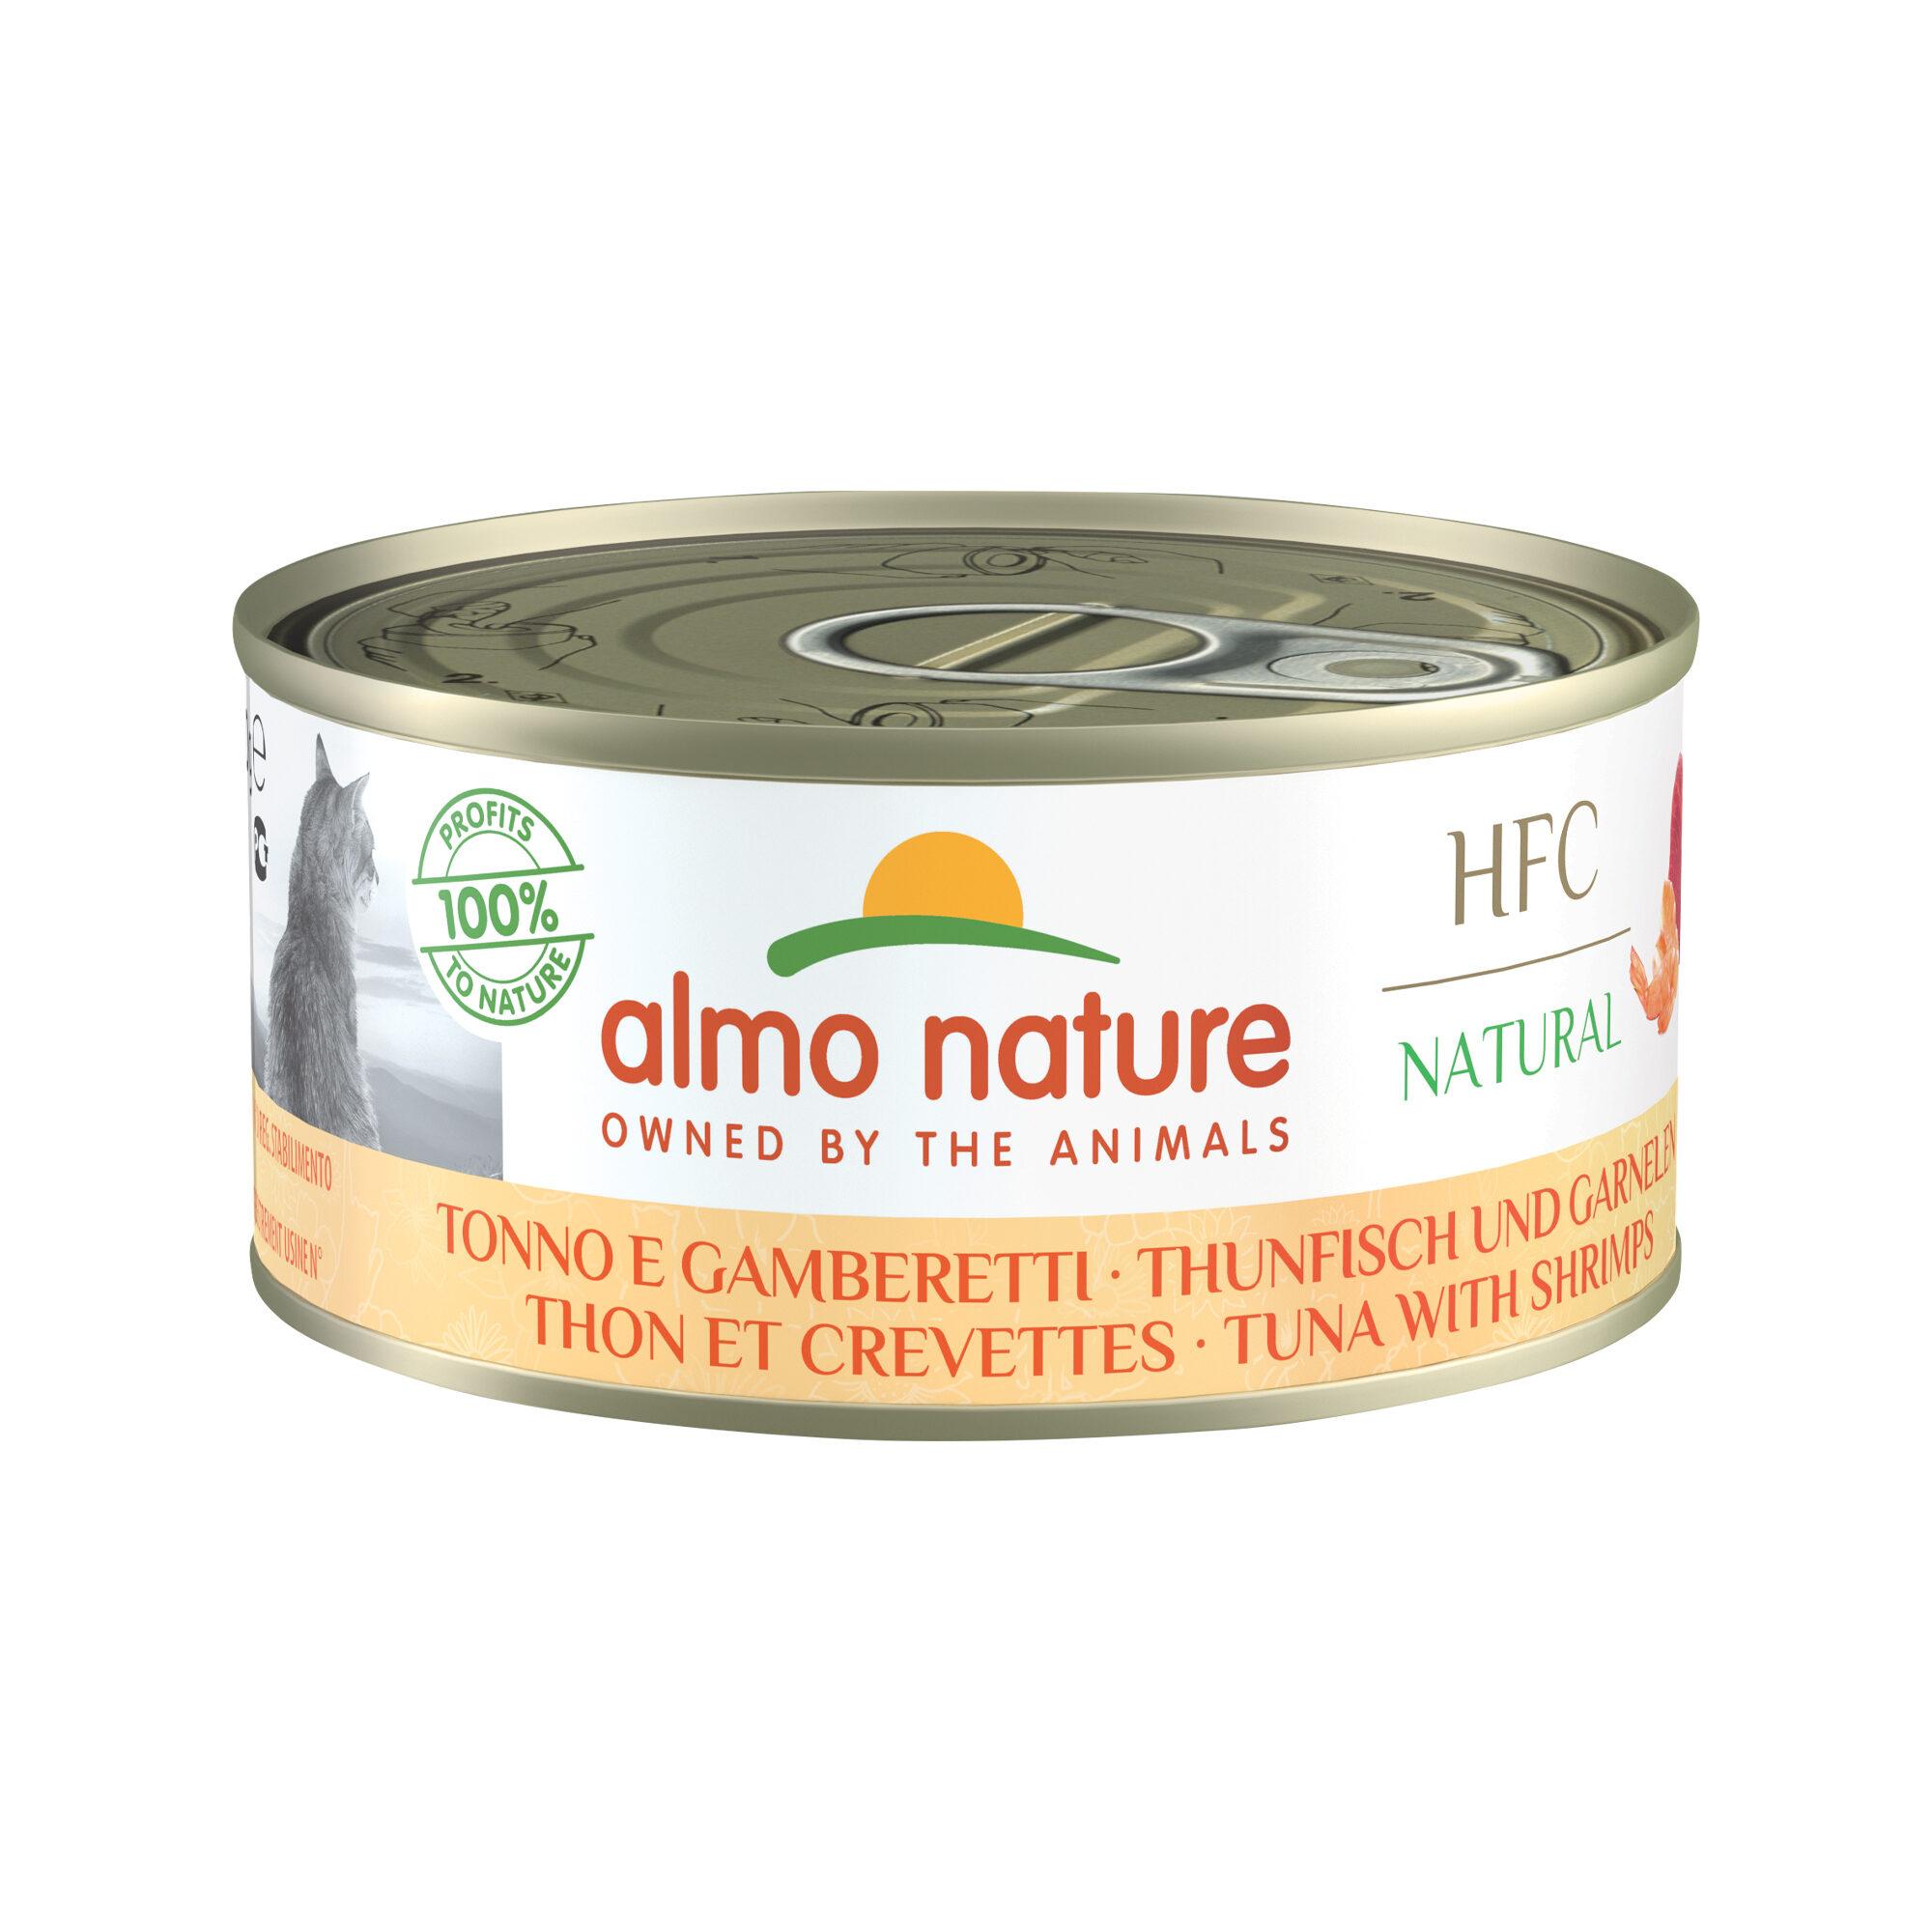 Almo Nature HFC 150 Natural Alimentation pour chat - Thon & crevette - 24 x 150 g